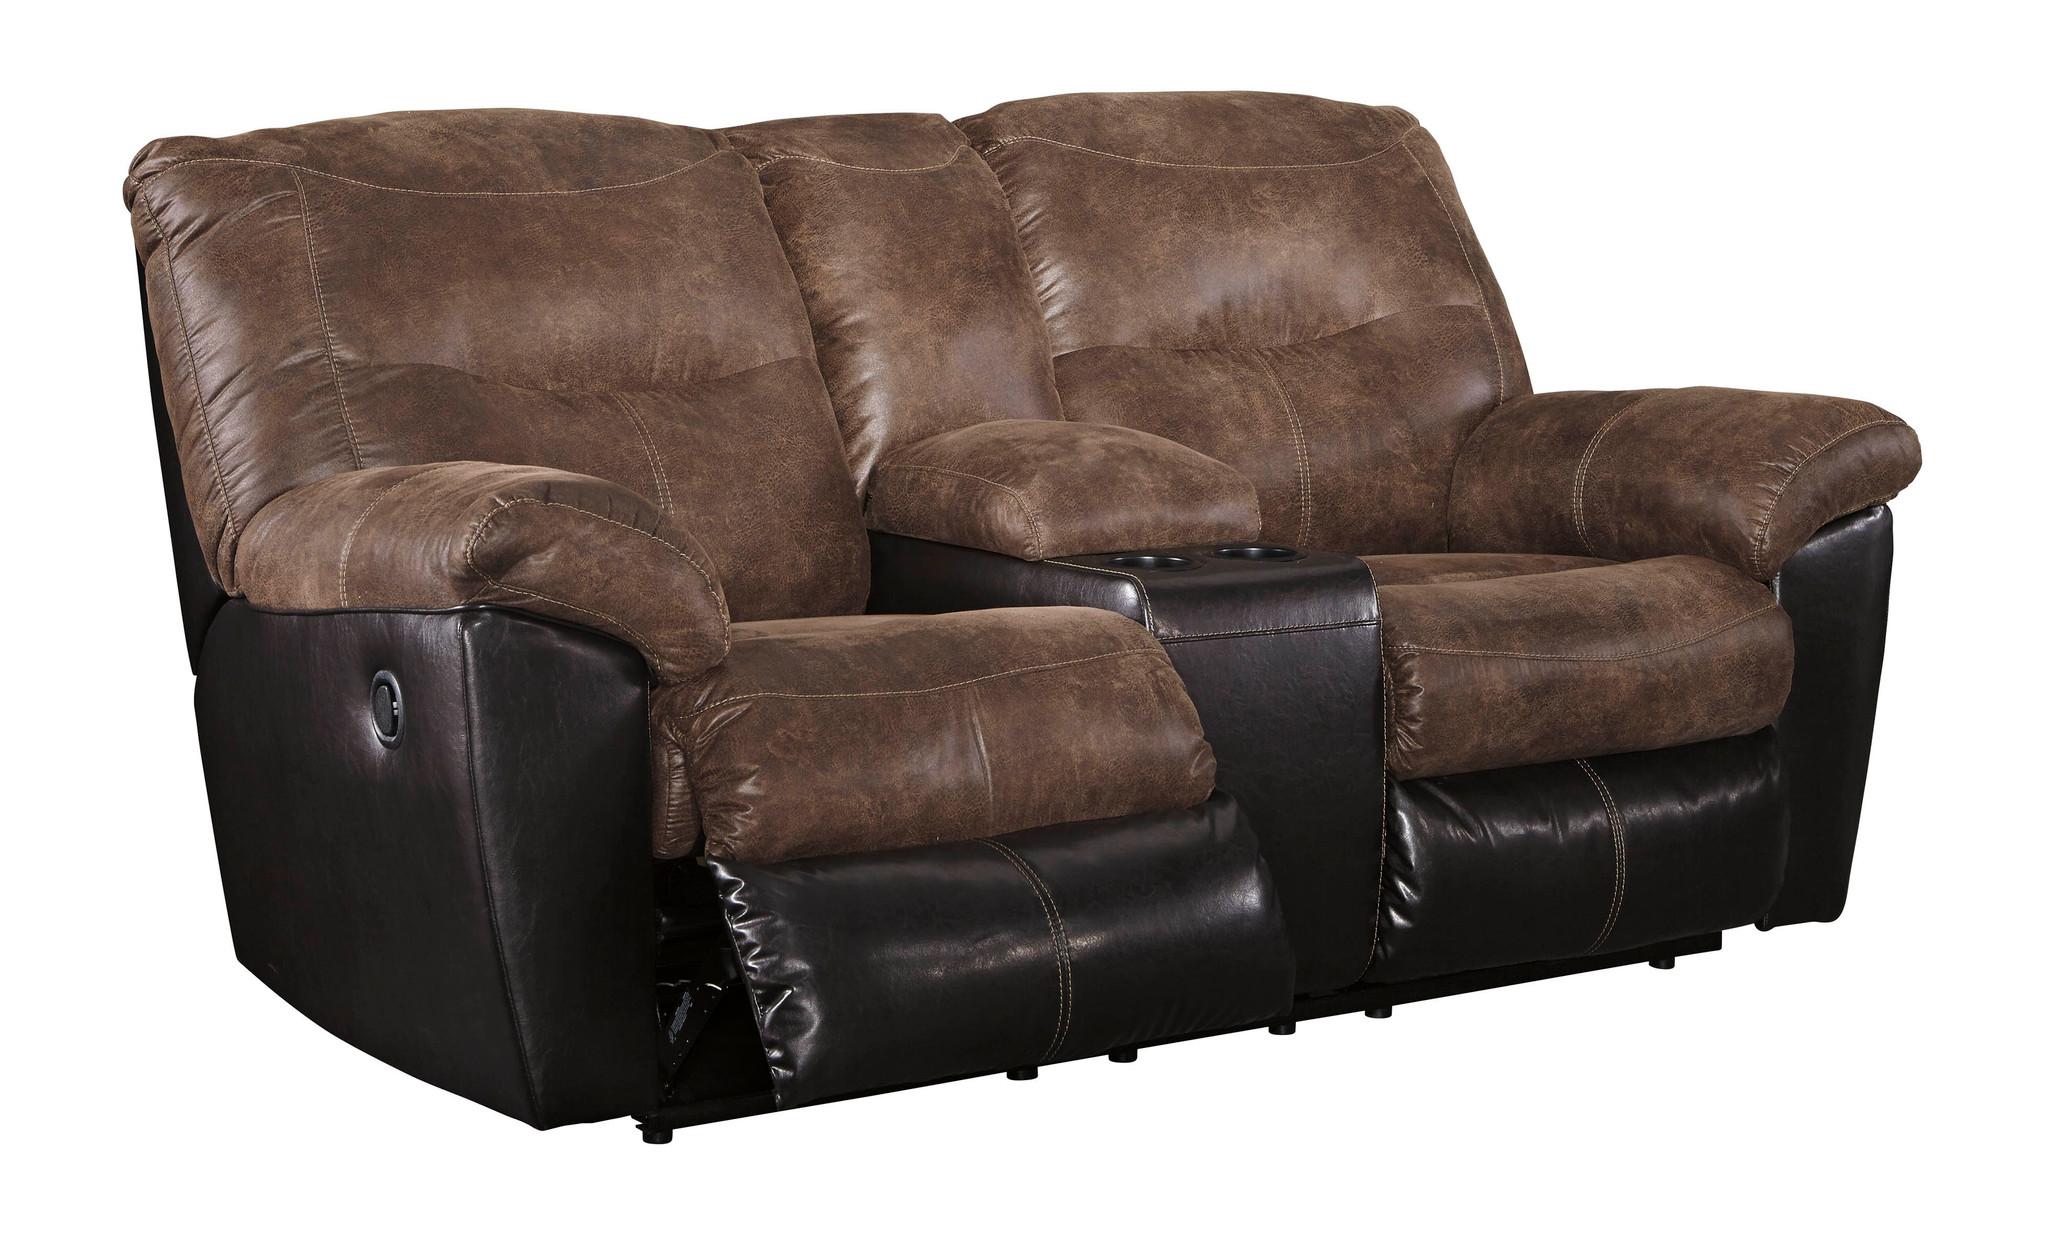 Awe Inspiring 2Pc Follett Coffee Sofa And Loveseat Reclining Set Ibusinesslaw Wood Chair Design Ideas Ibusinesslaworg